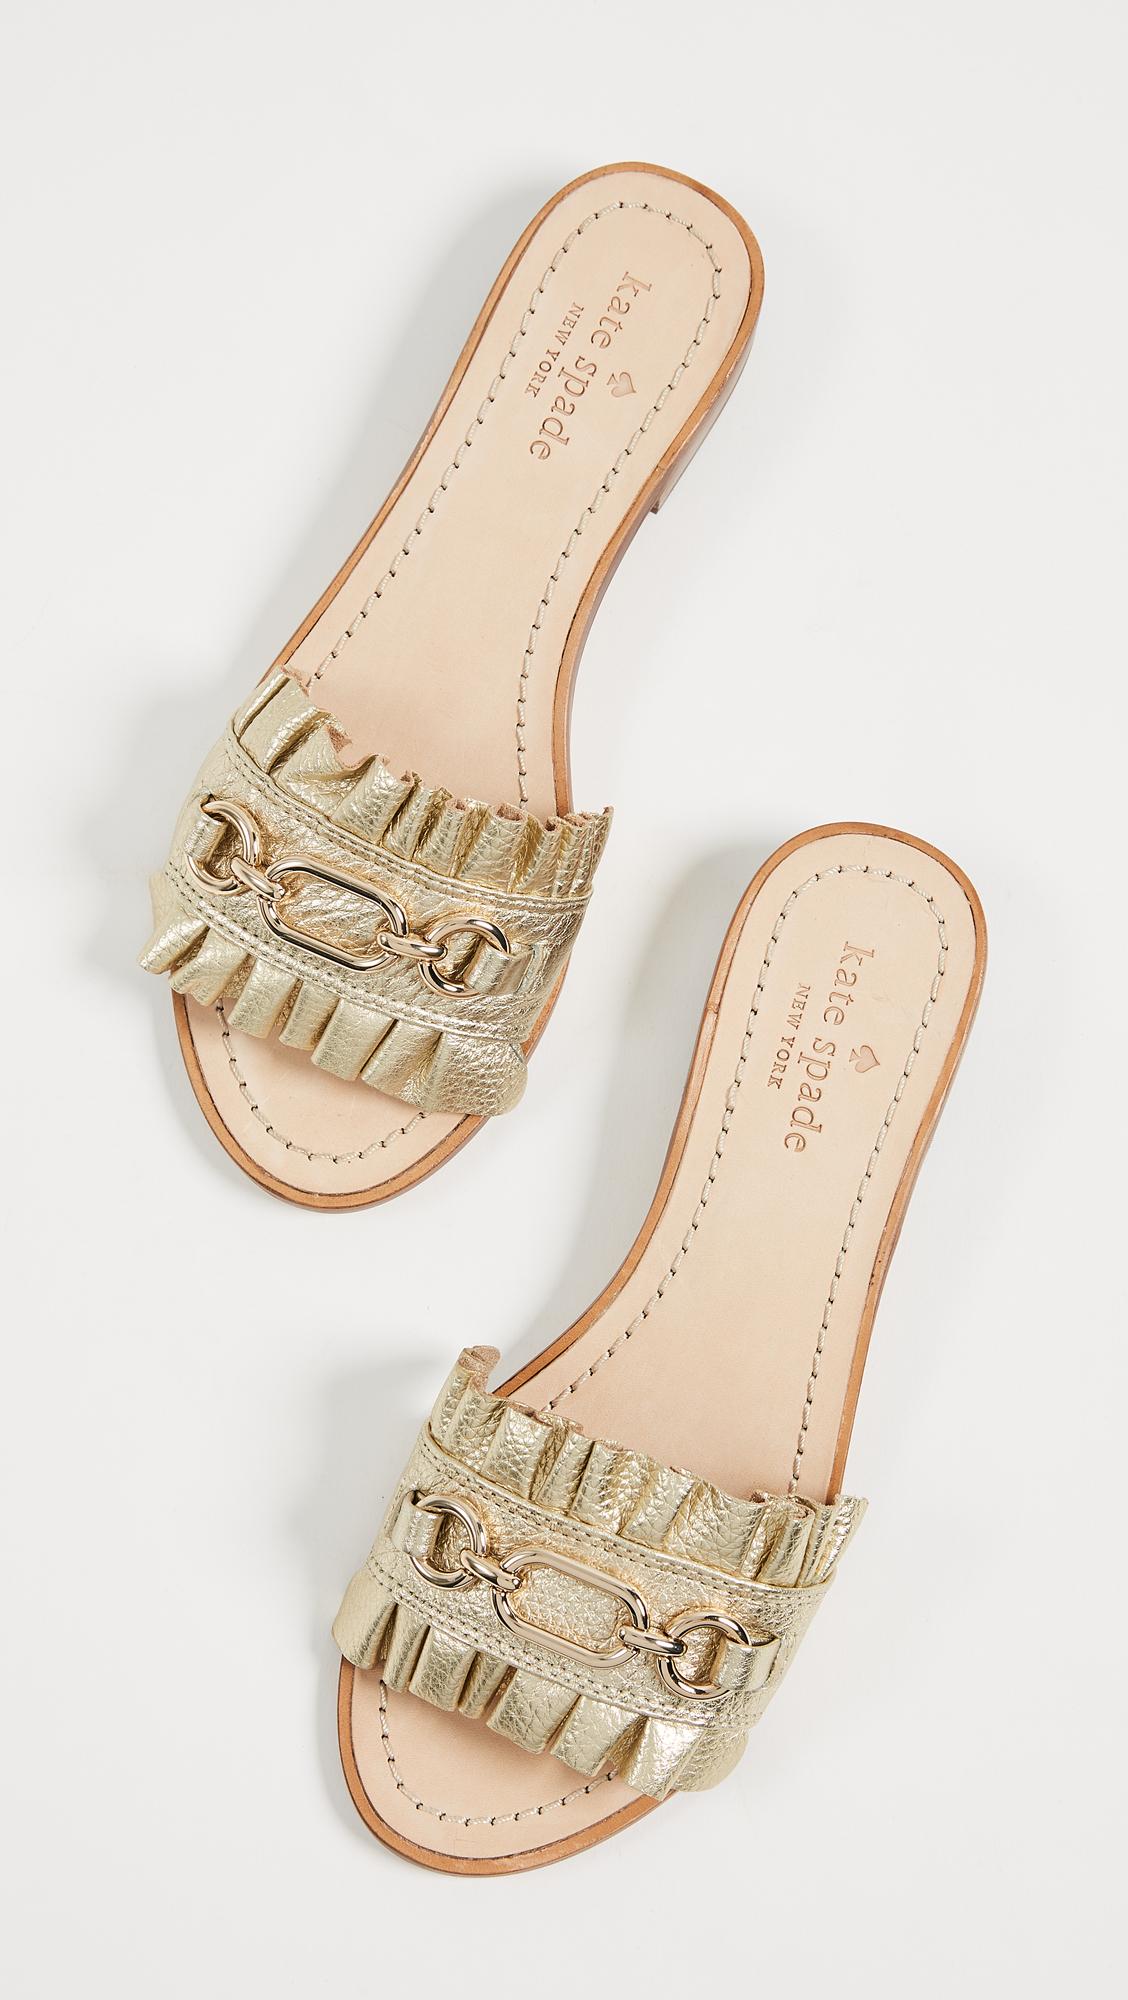 3c13a74dc062 Kate Spade New York Beau Slides